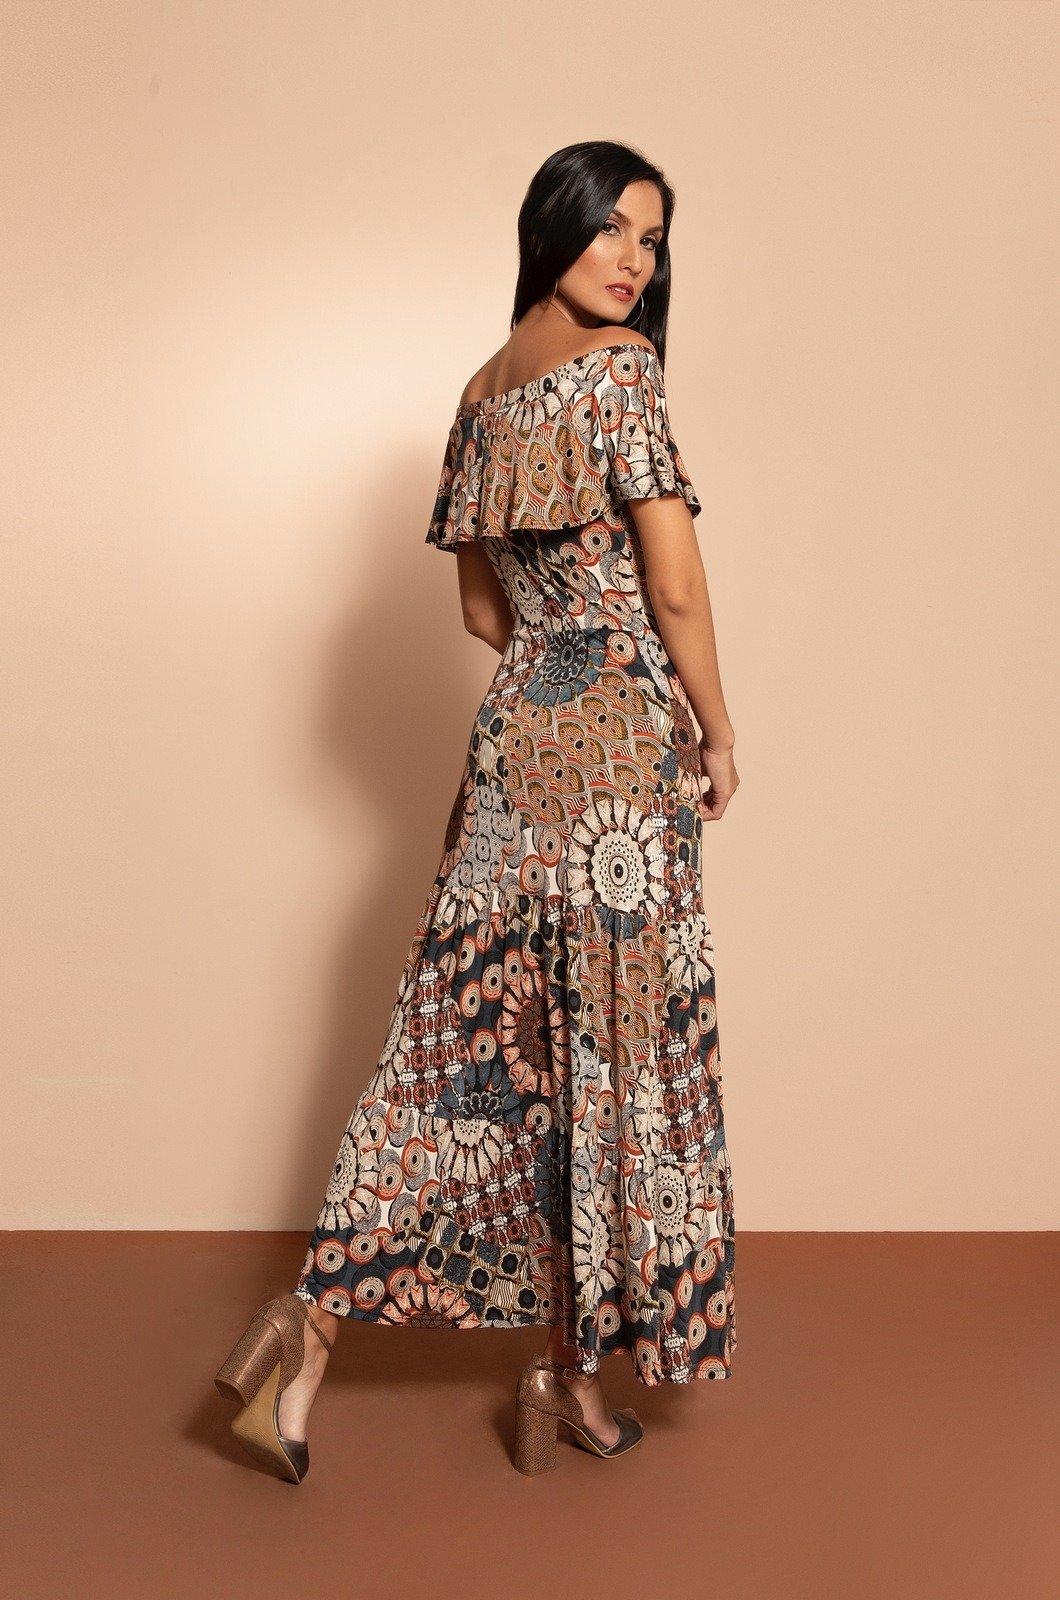 Vestido campesino largo - Chazari 6940-20 02